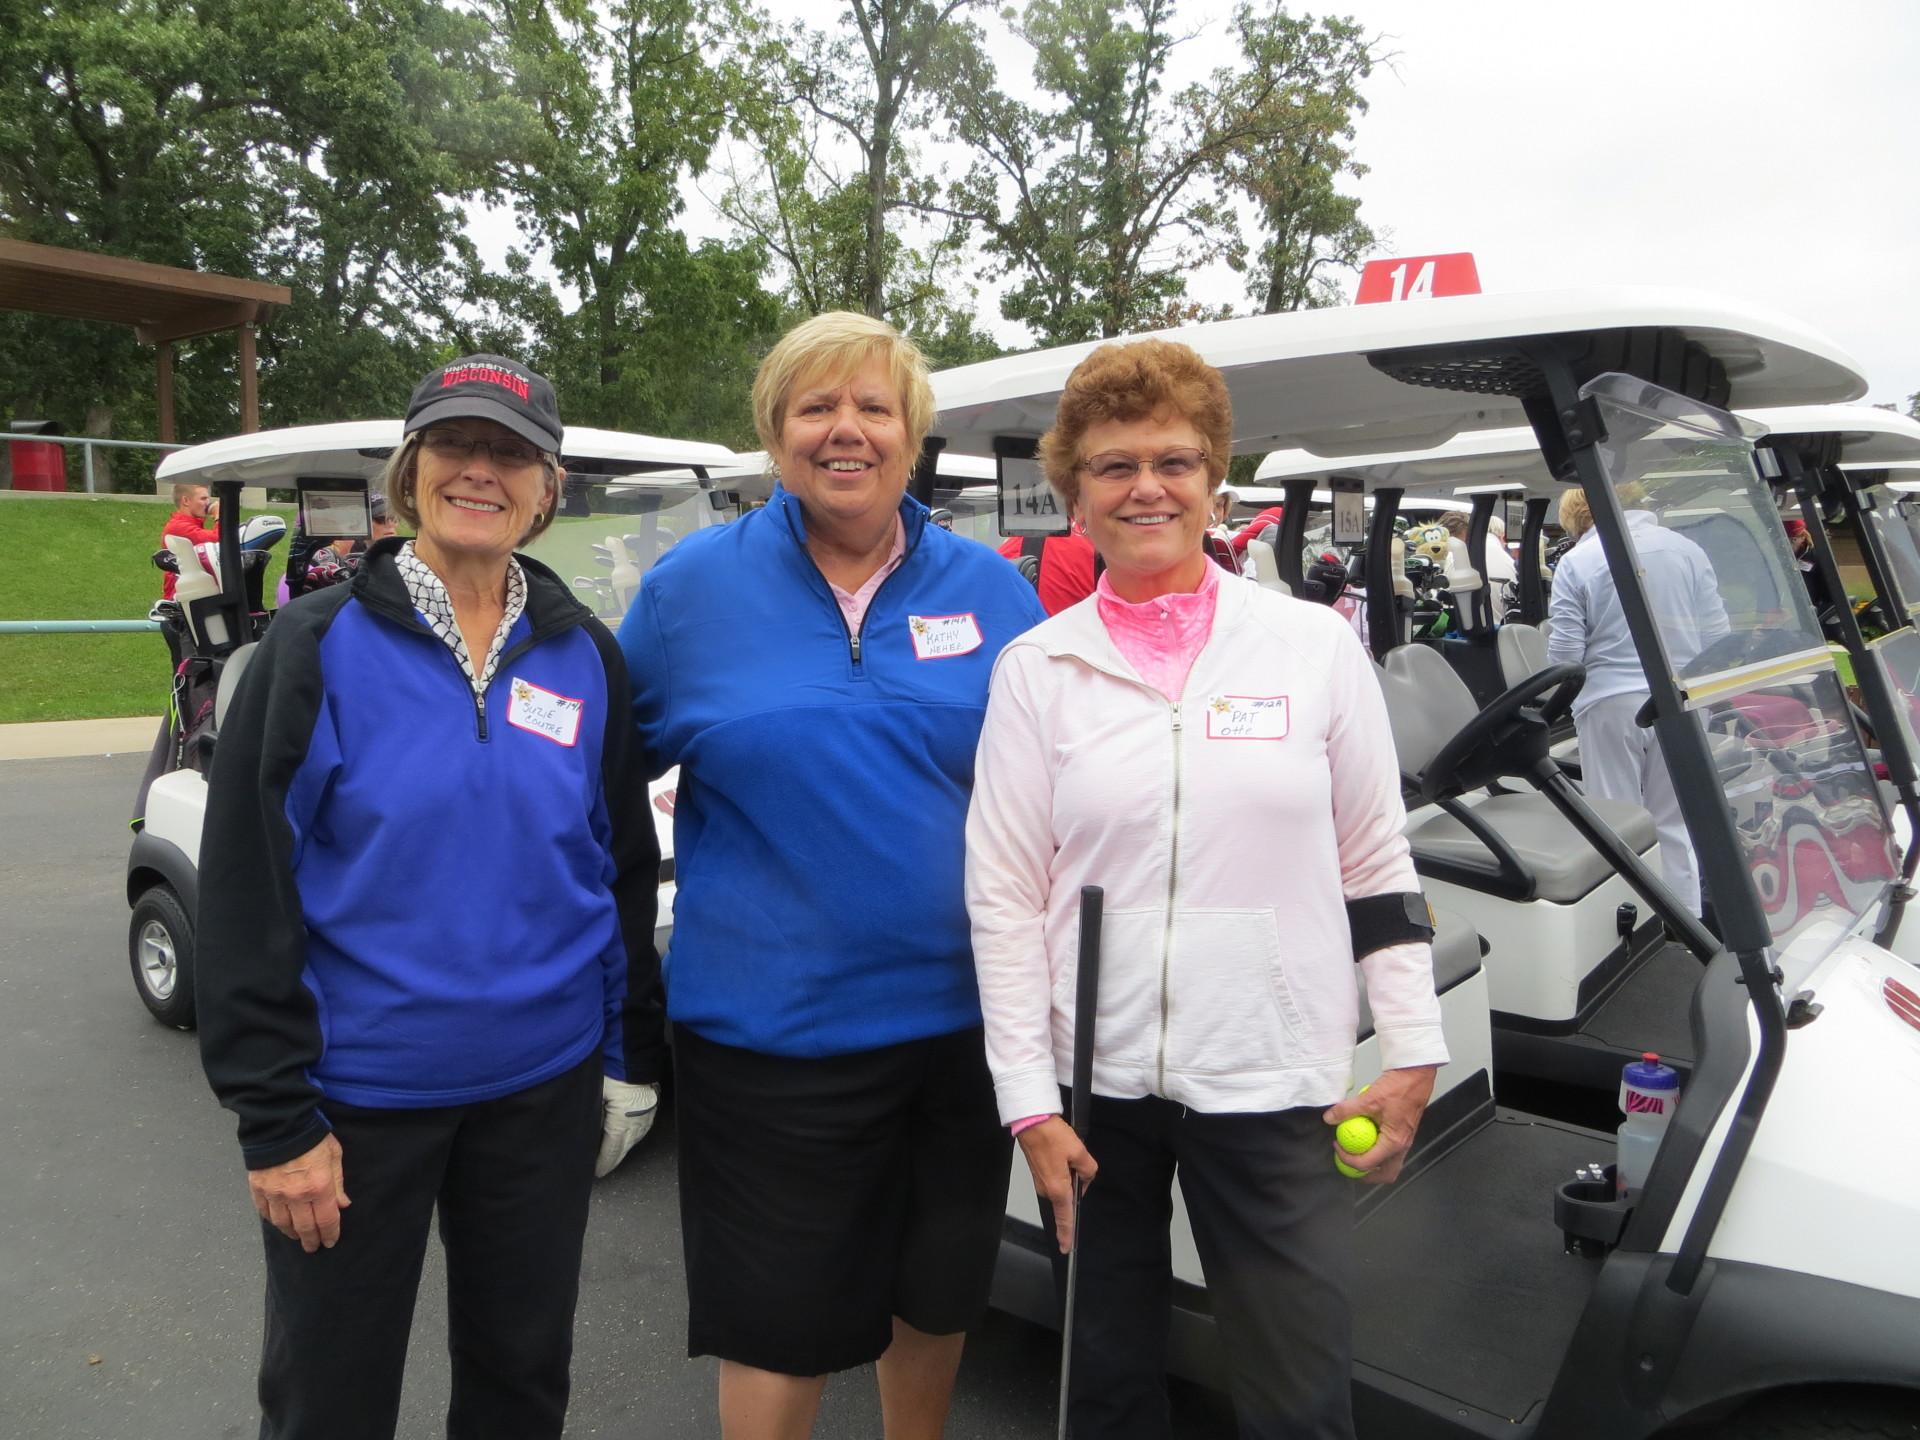 WMGA, women;s golf, leagues, Madison, WI